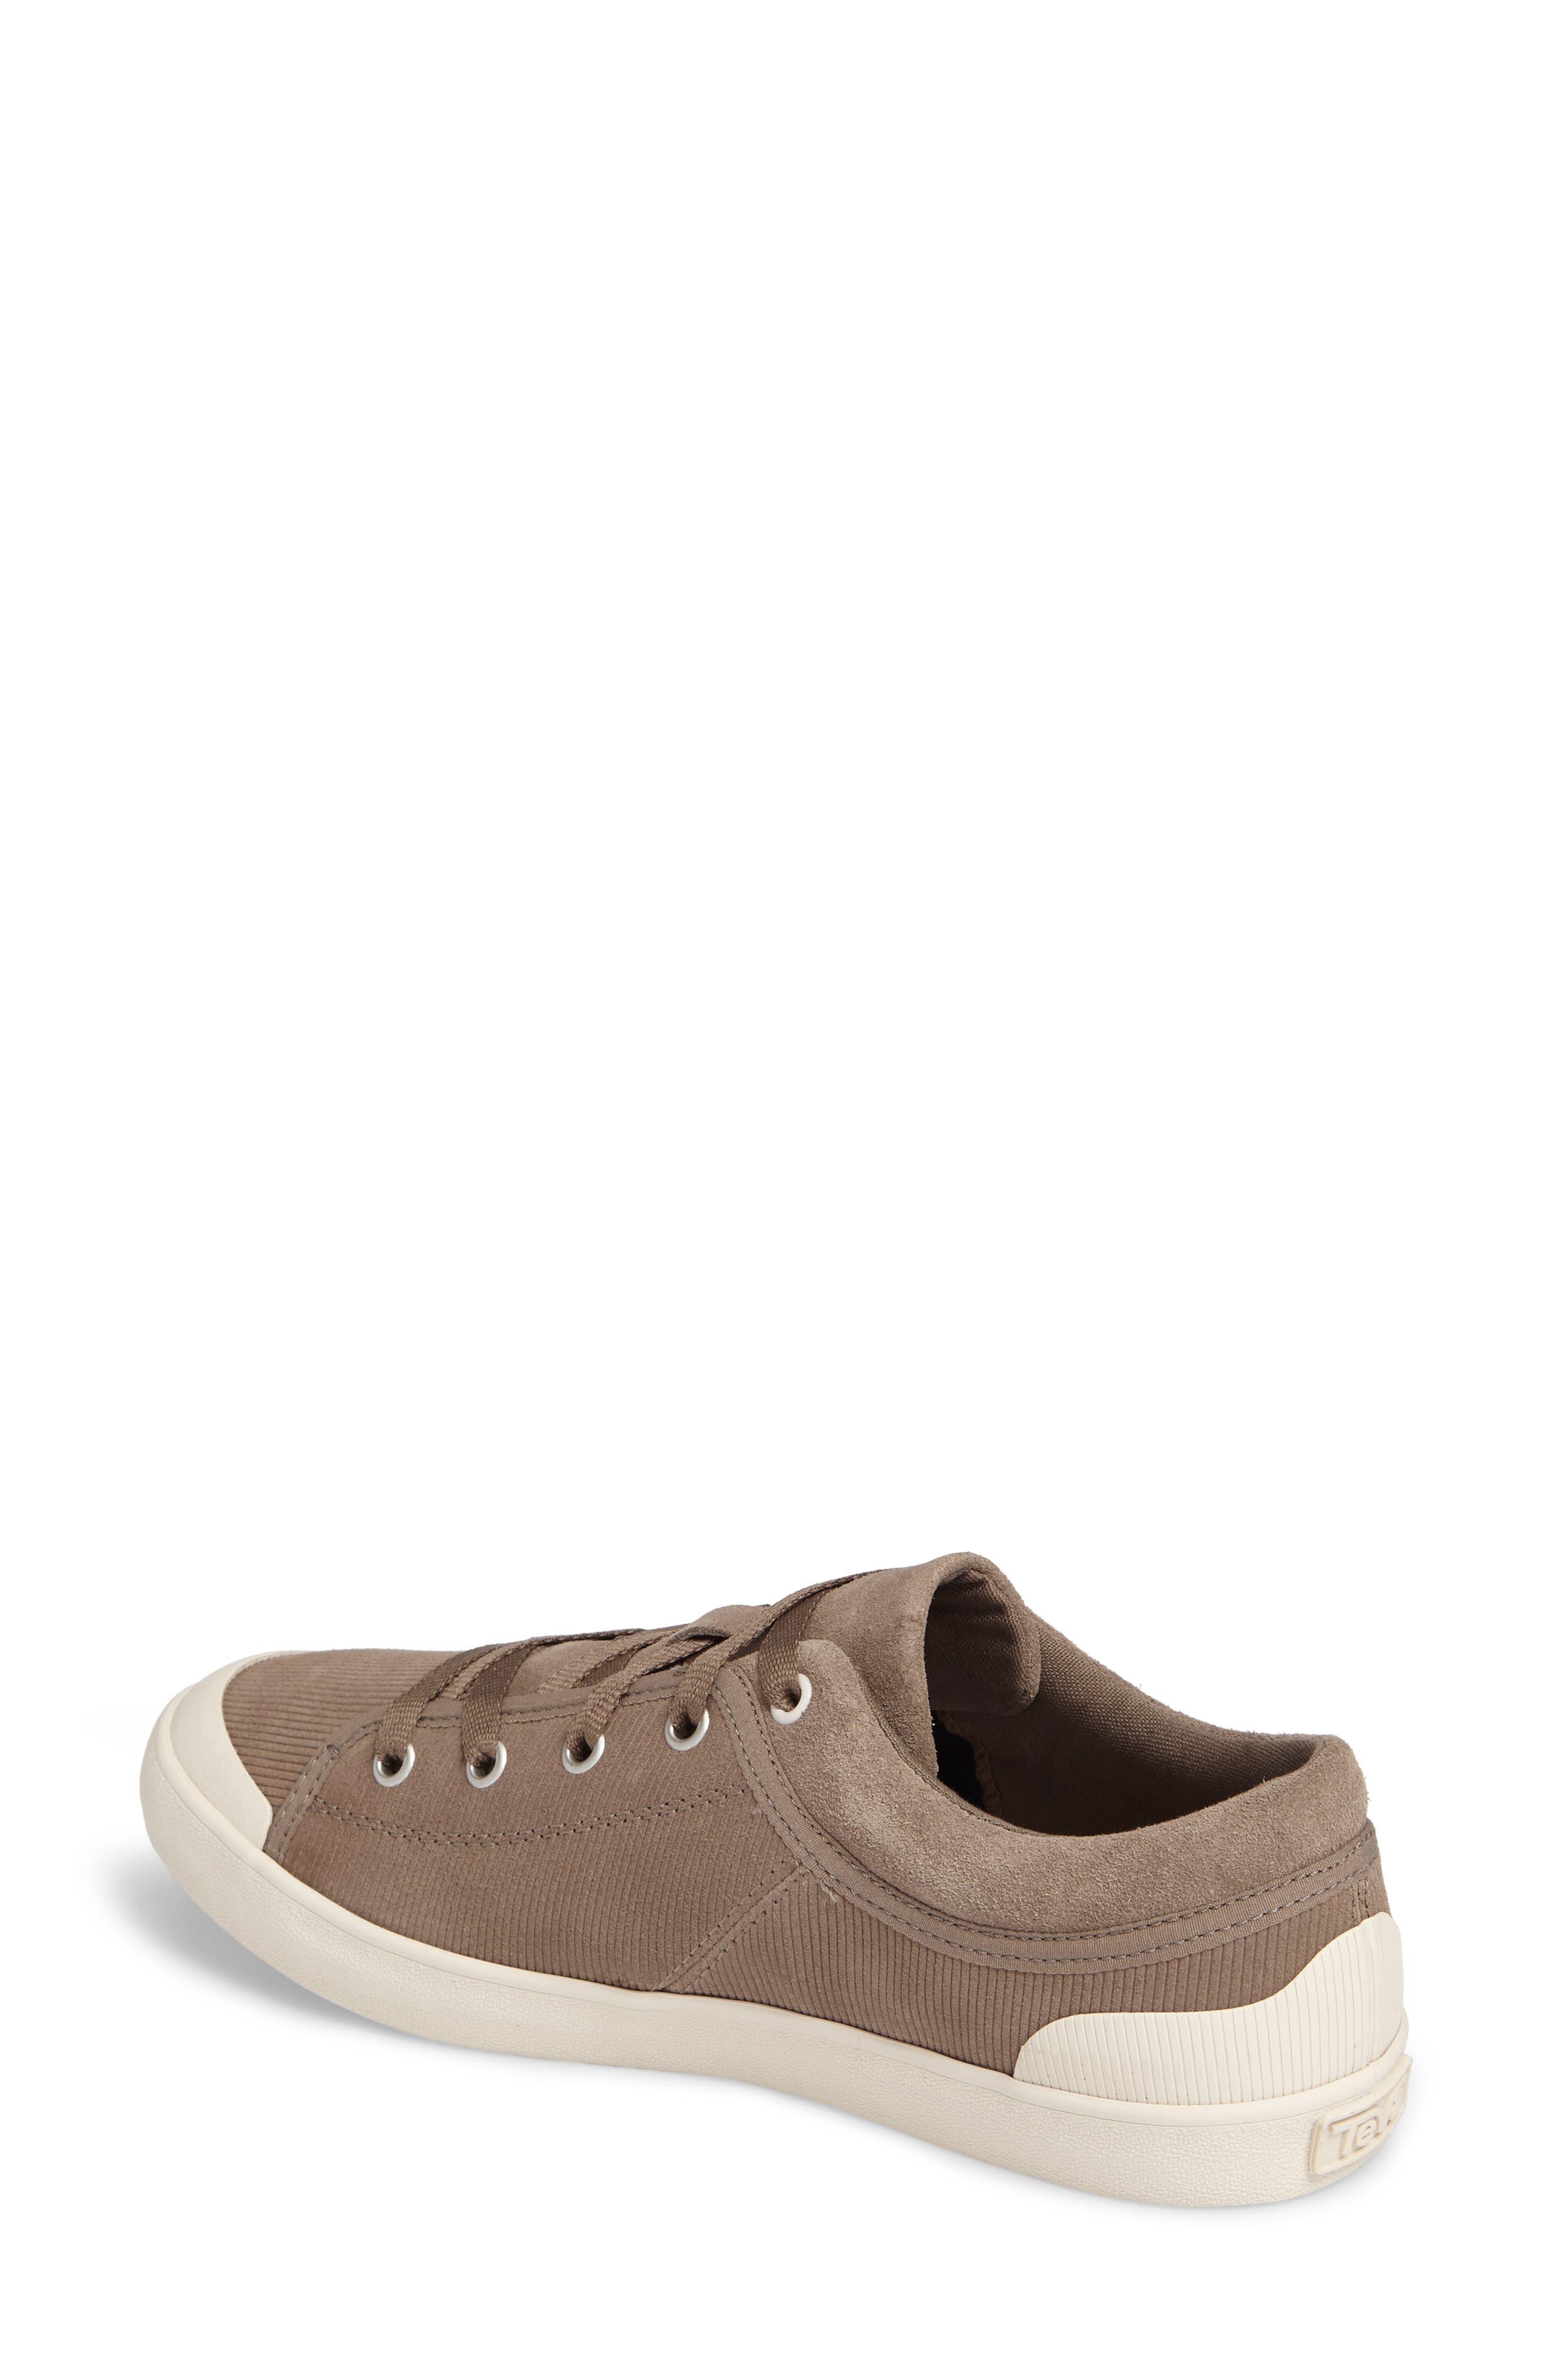 Freewheel Sneaker,                             Alternate thumbnail 2, color,                             240